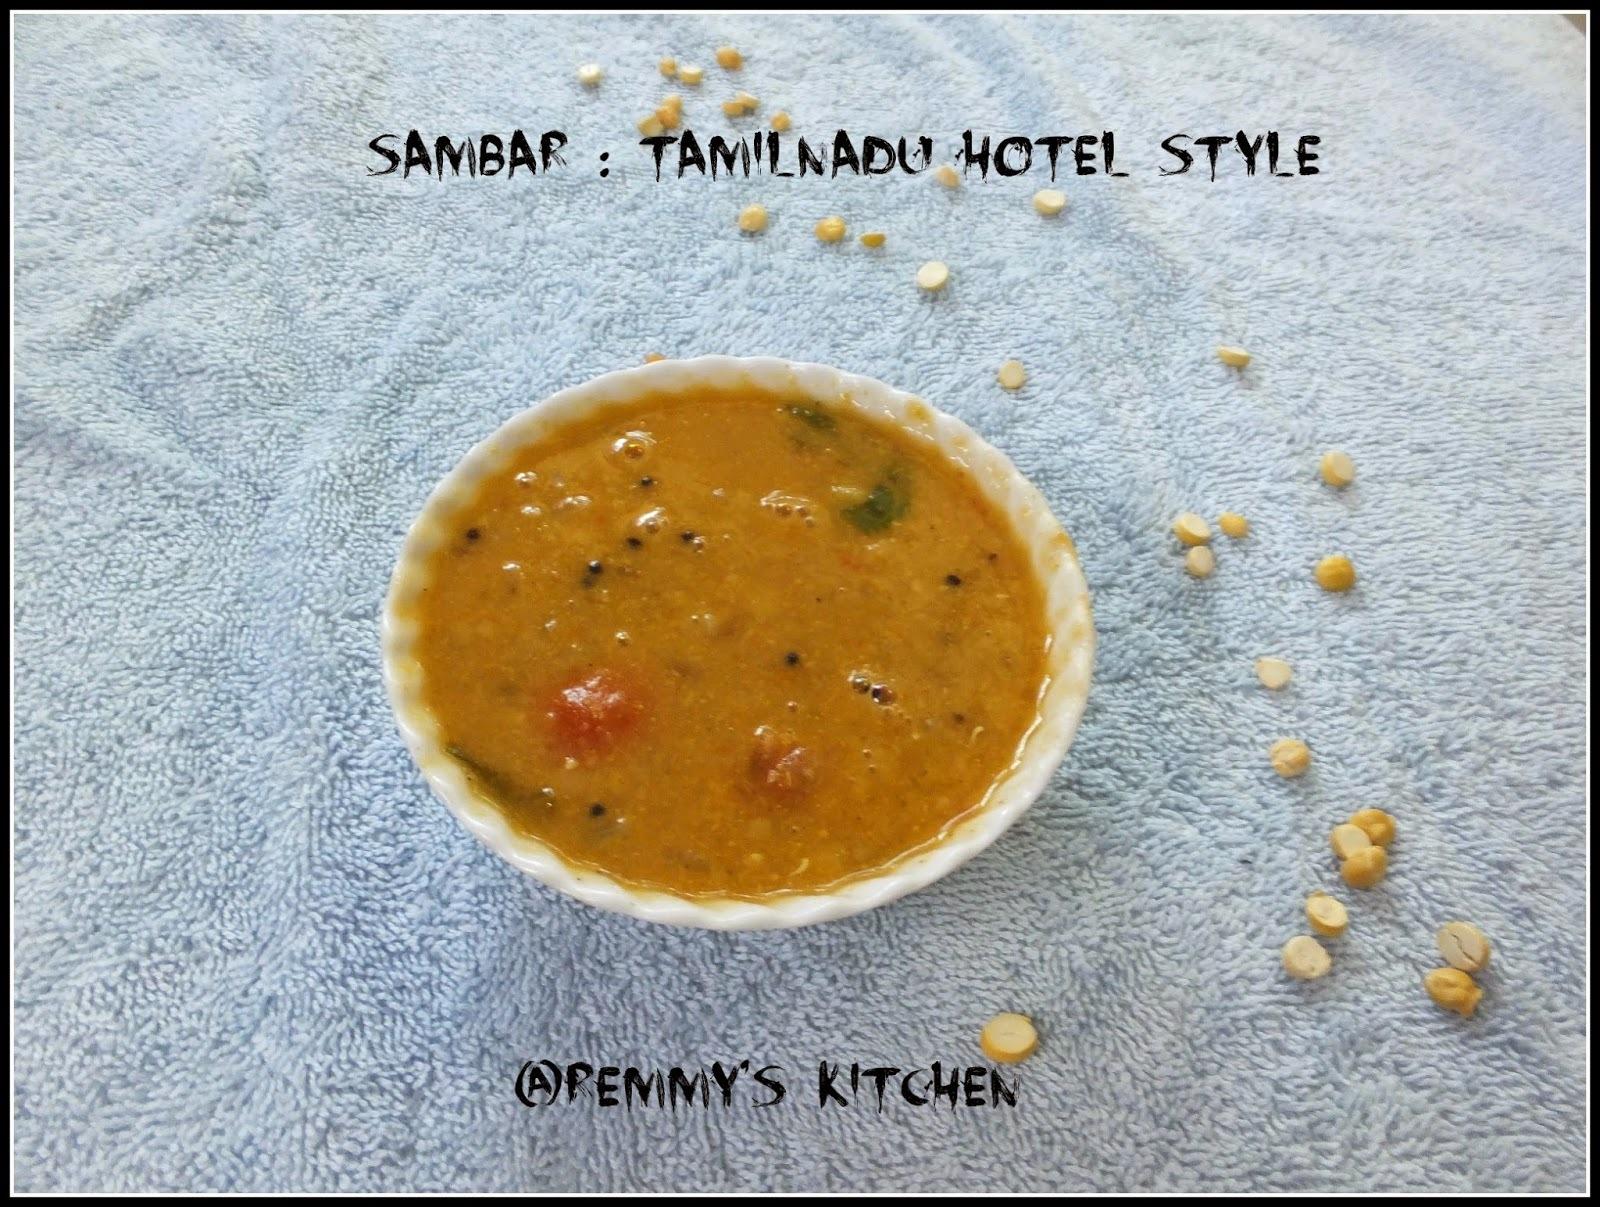 Sambar: Tamilnadu Hotel style